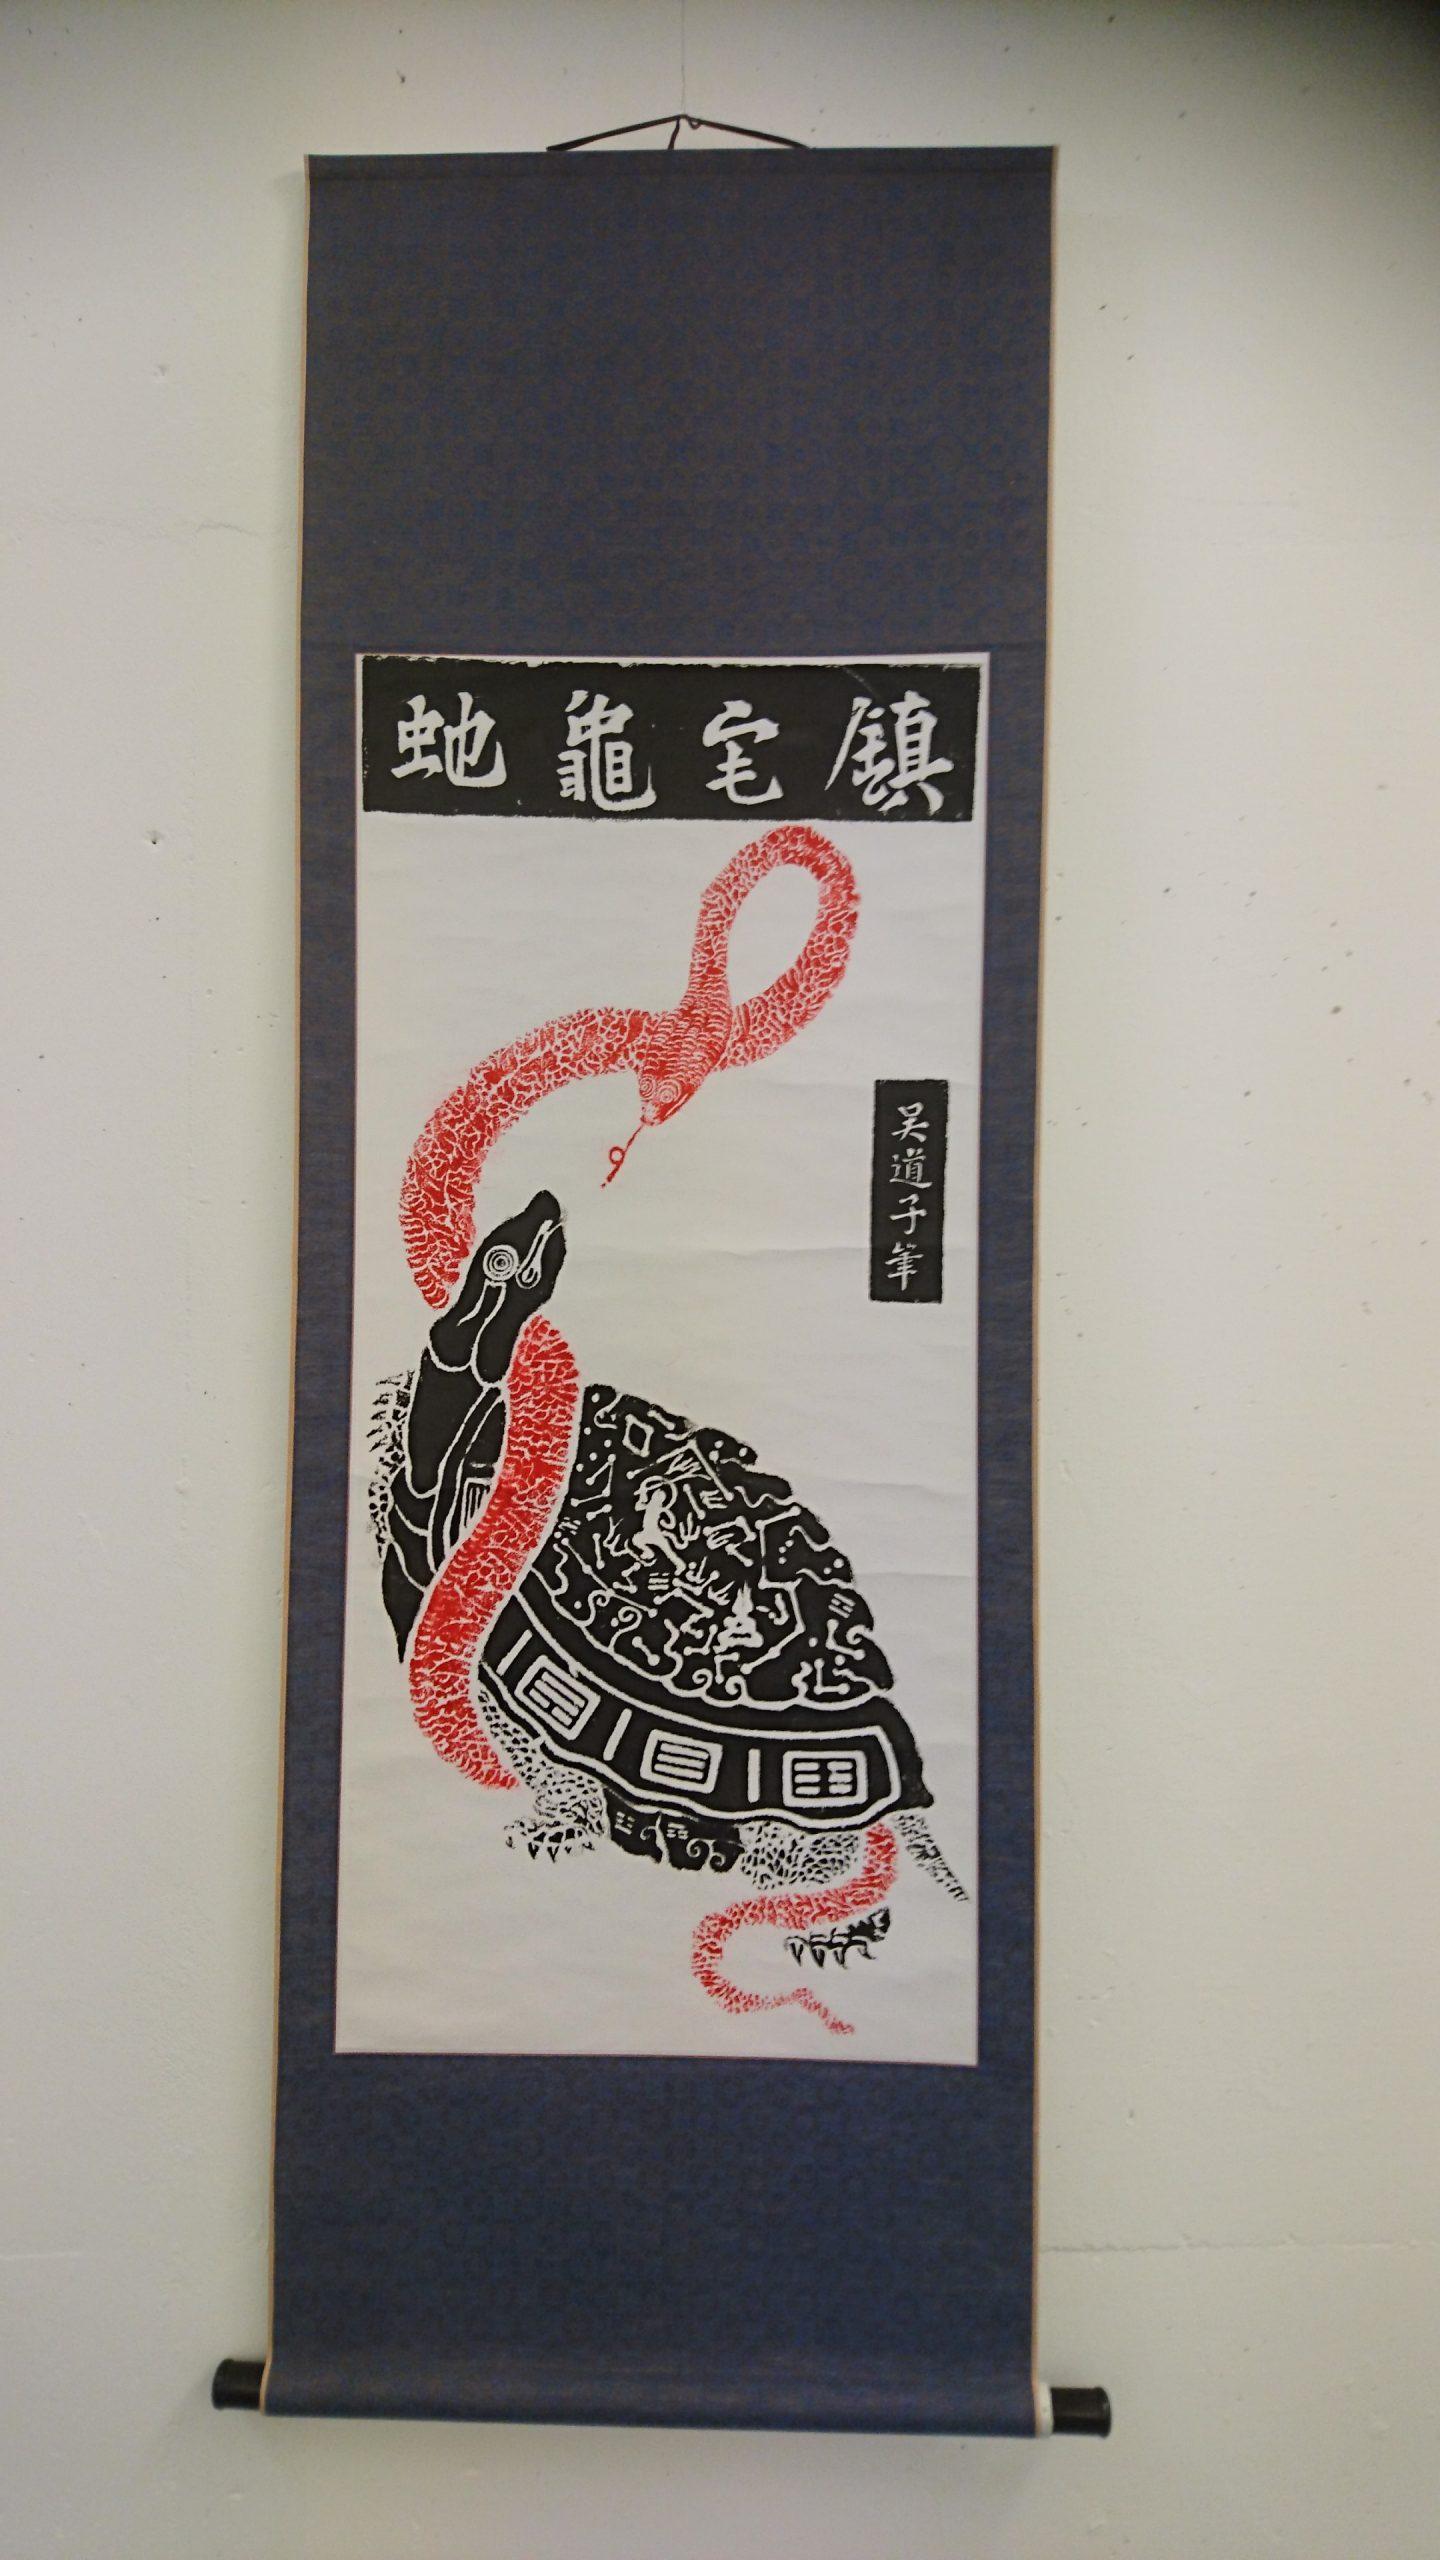 Afbeelding schildpad slang Wudang